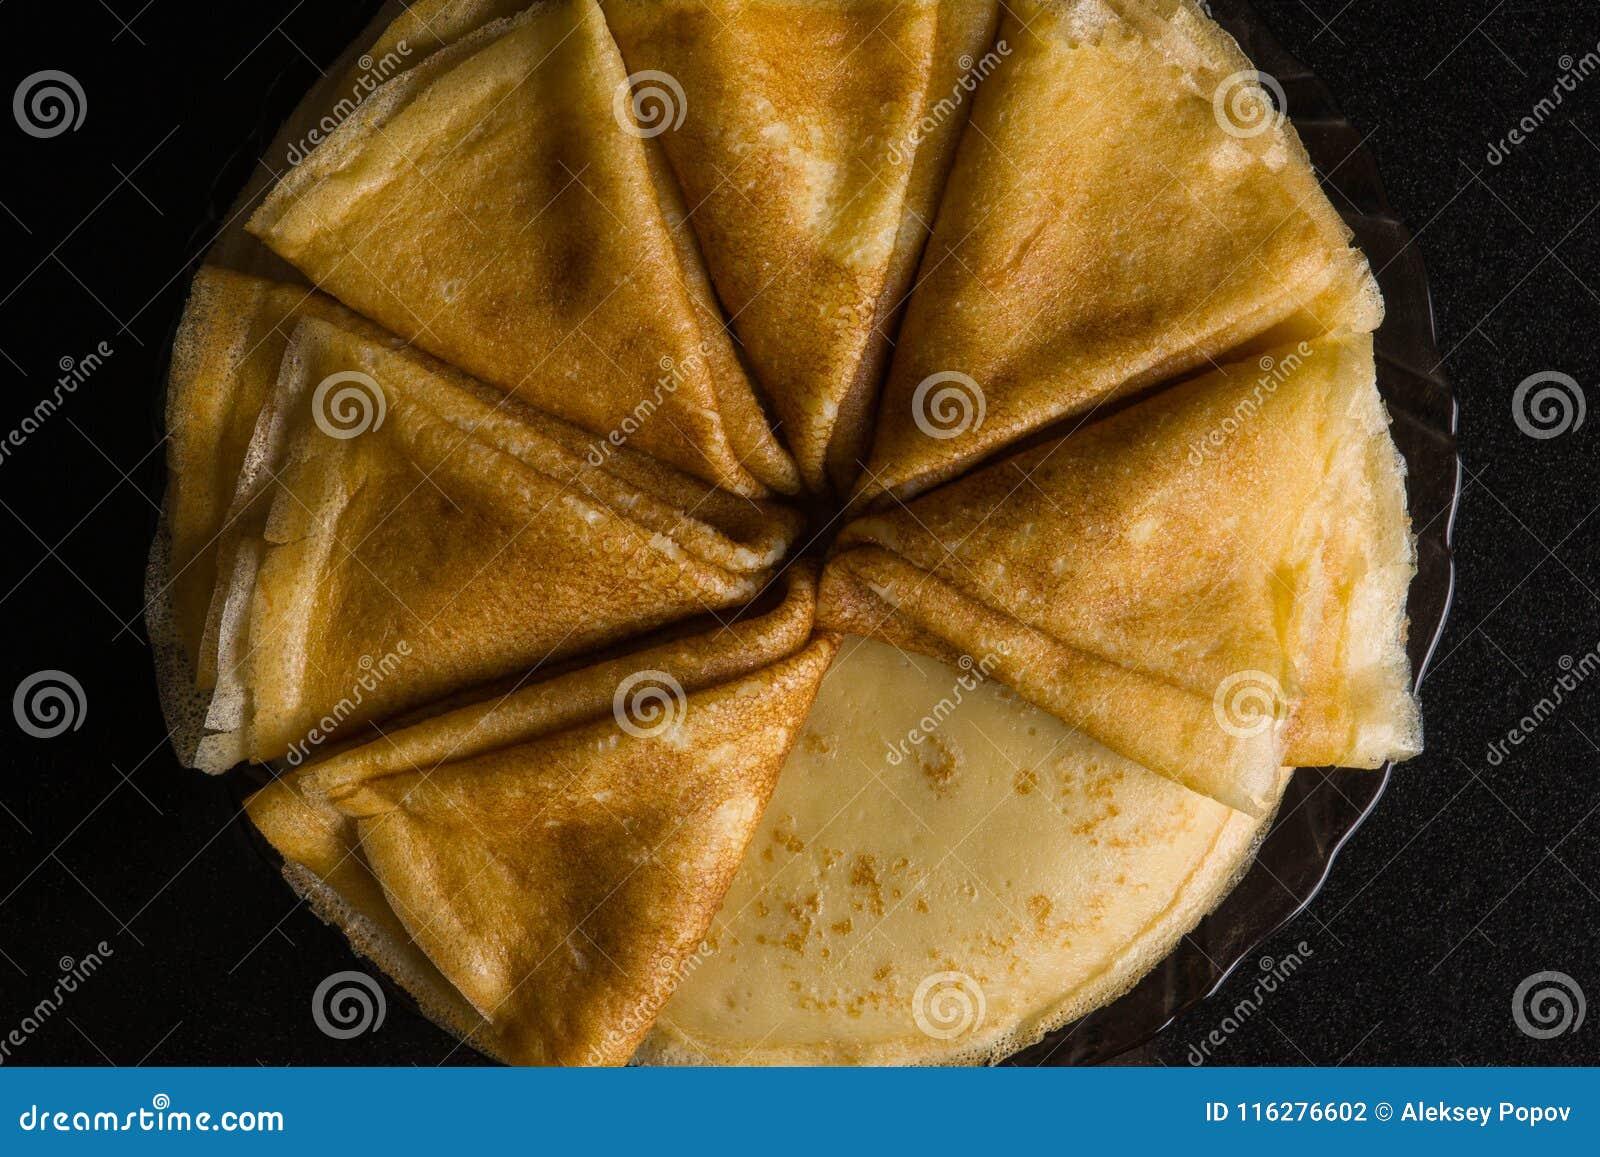 Pfannkuchen Dünne Pfannkuchen Russisches bliny maslenitsa, Blini, Frühstück, Krepp, Honig, Gebäck, Stapel, Pfannkuchen, Russe, Hi